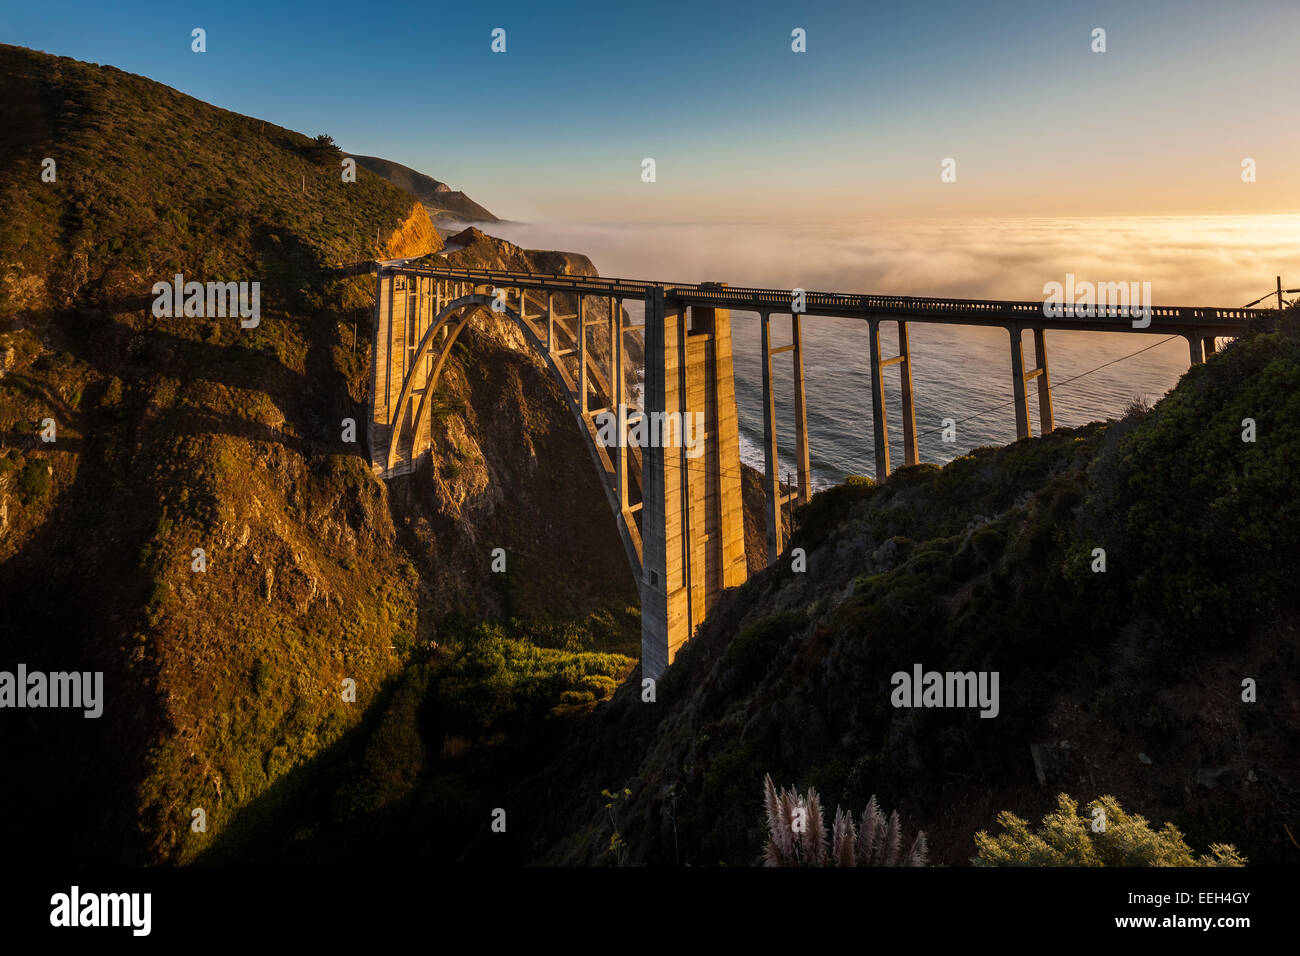 https://c7.alamy.com/comp/EEH4GY/bixby-bridge-pacific-coast-highway-big-sur-california-bixby-creek-EEH4GY.jpg